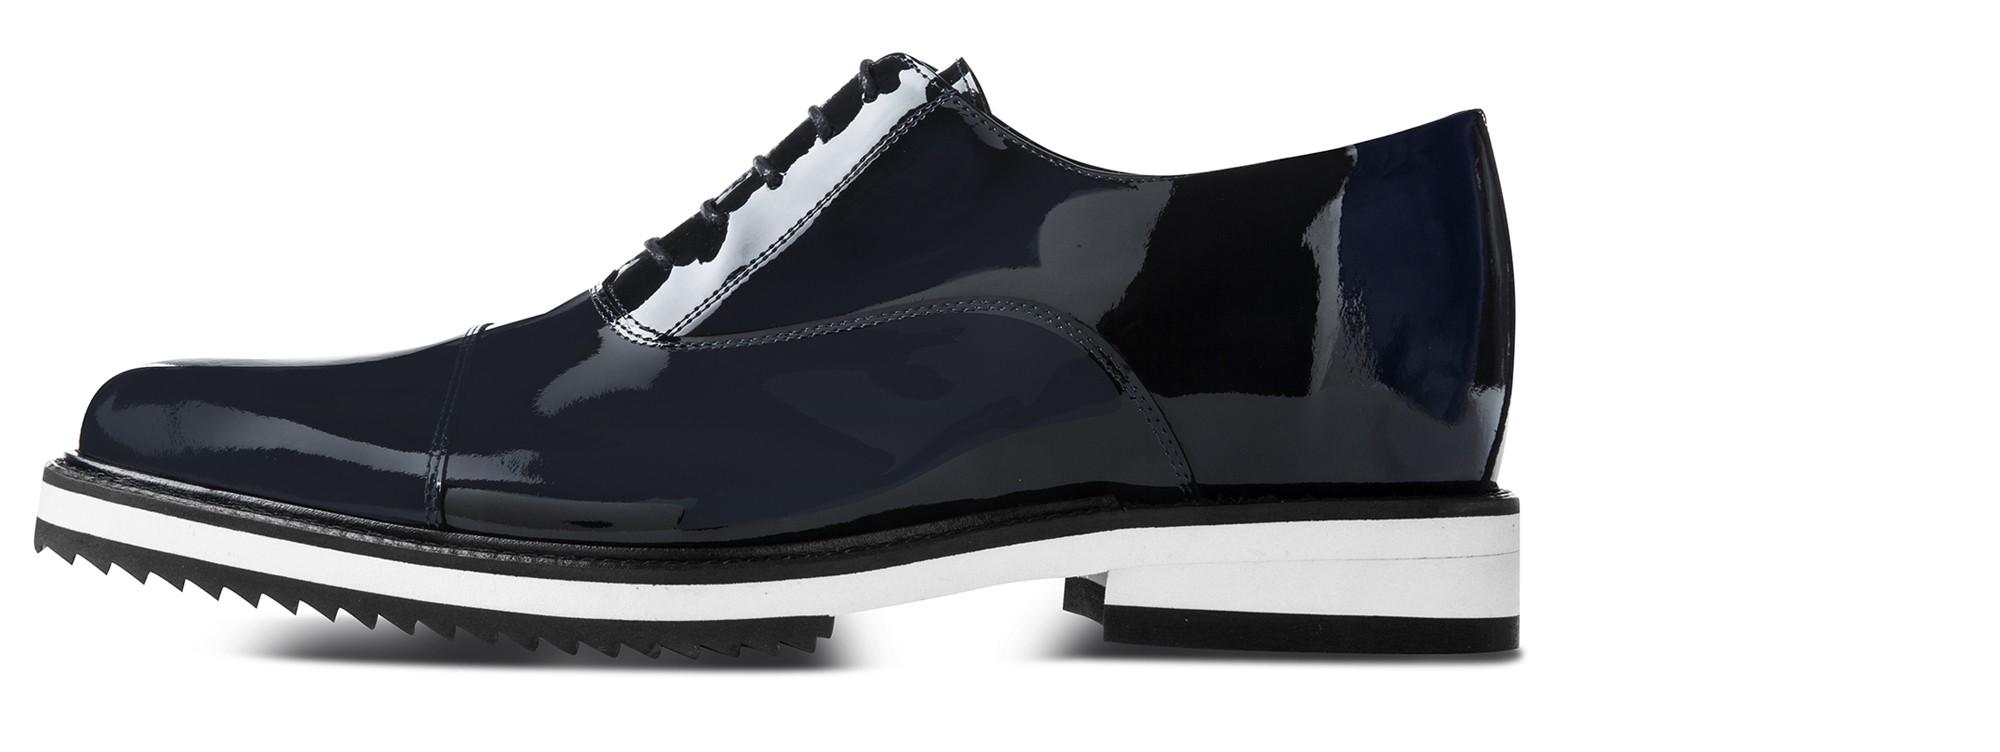 elevator shoes